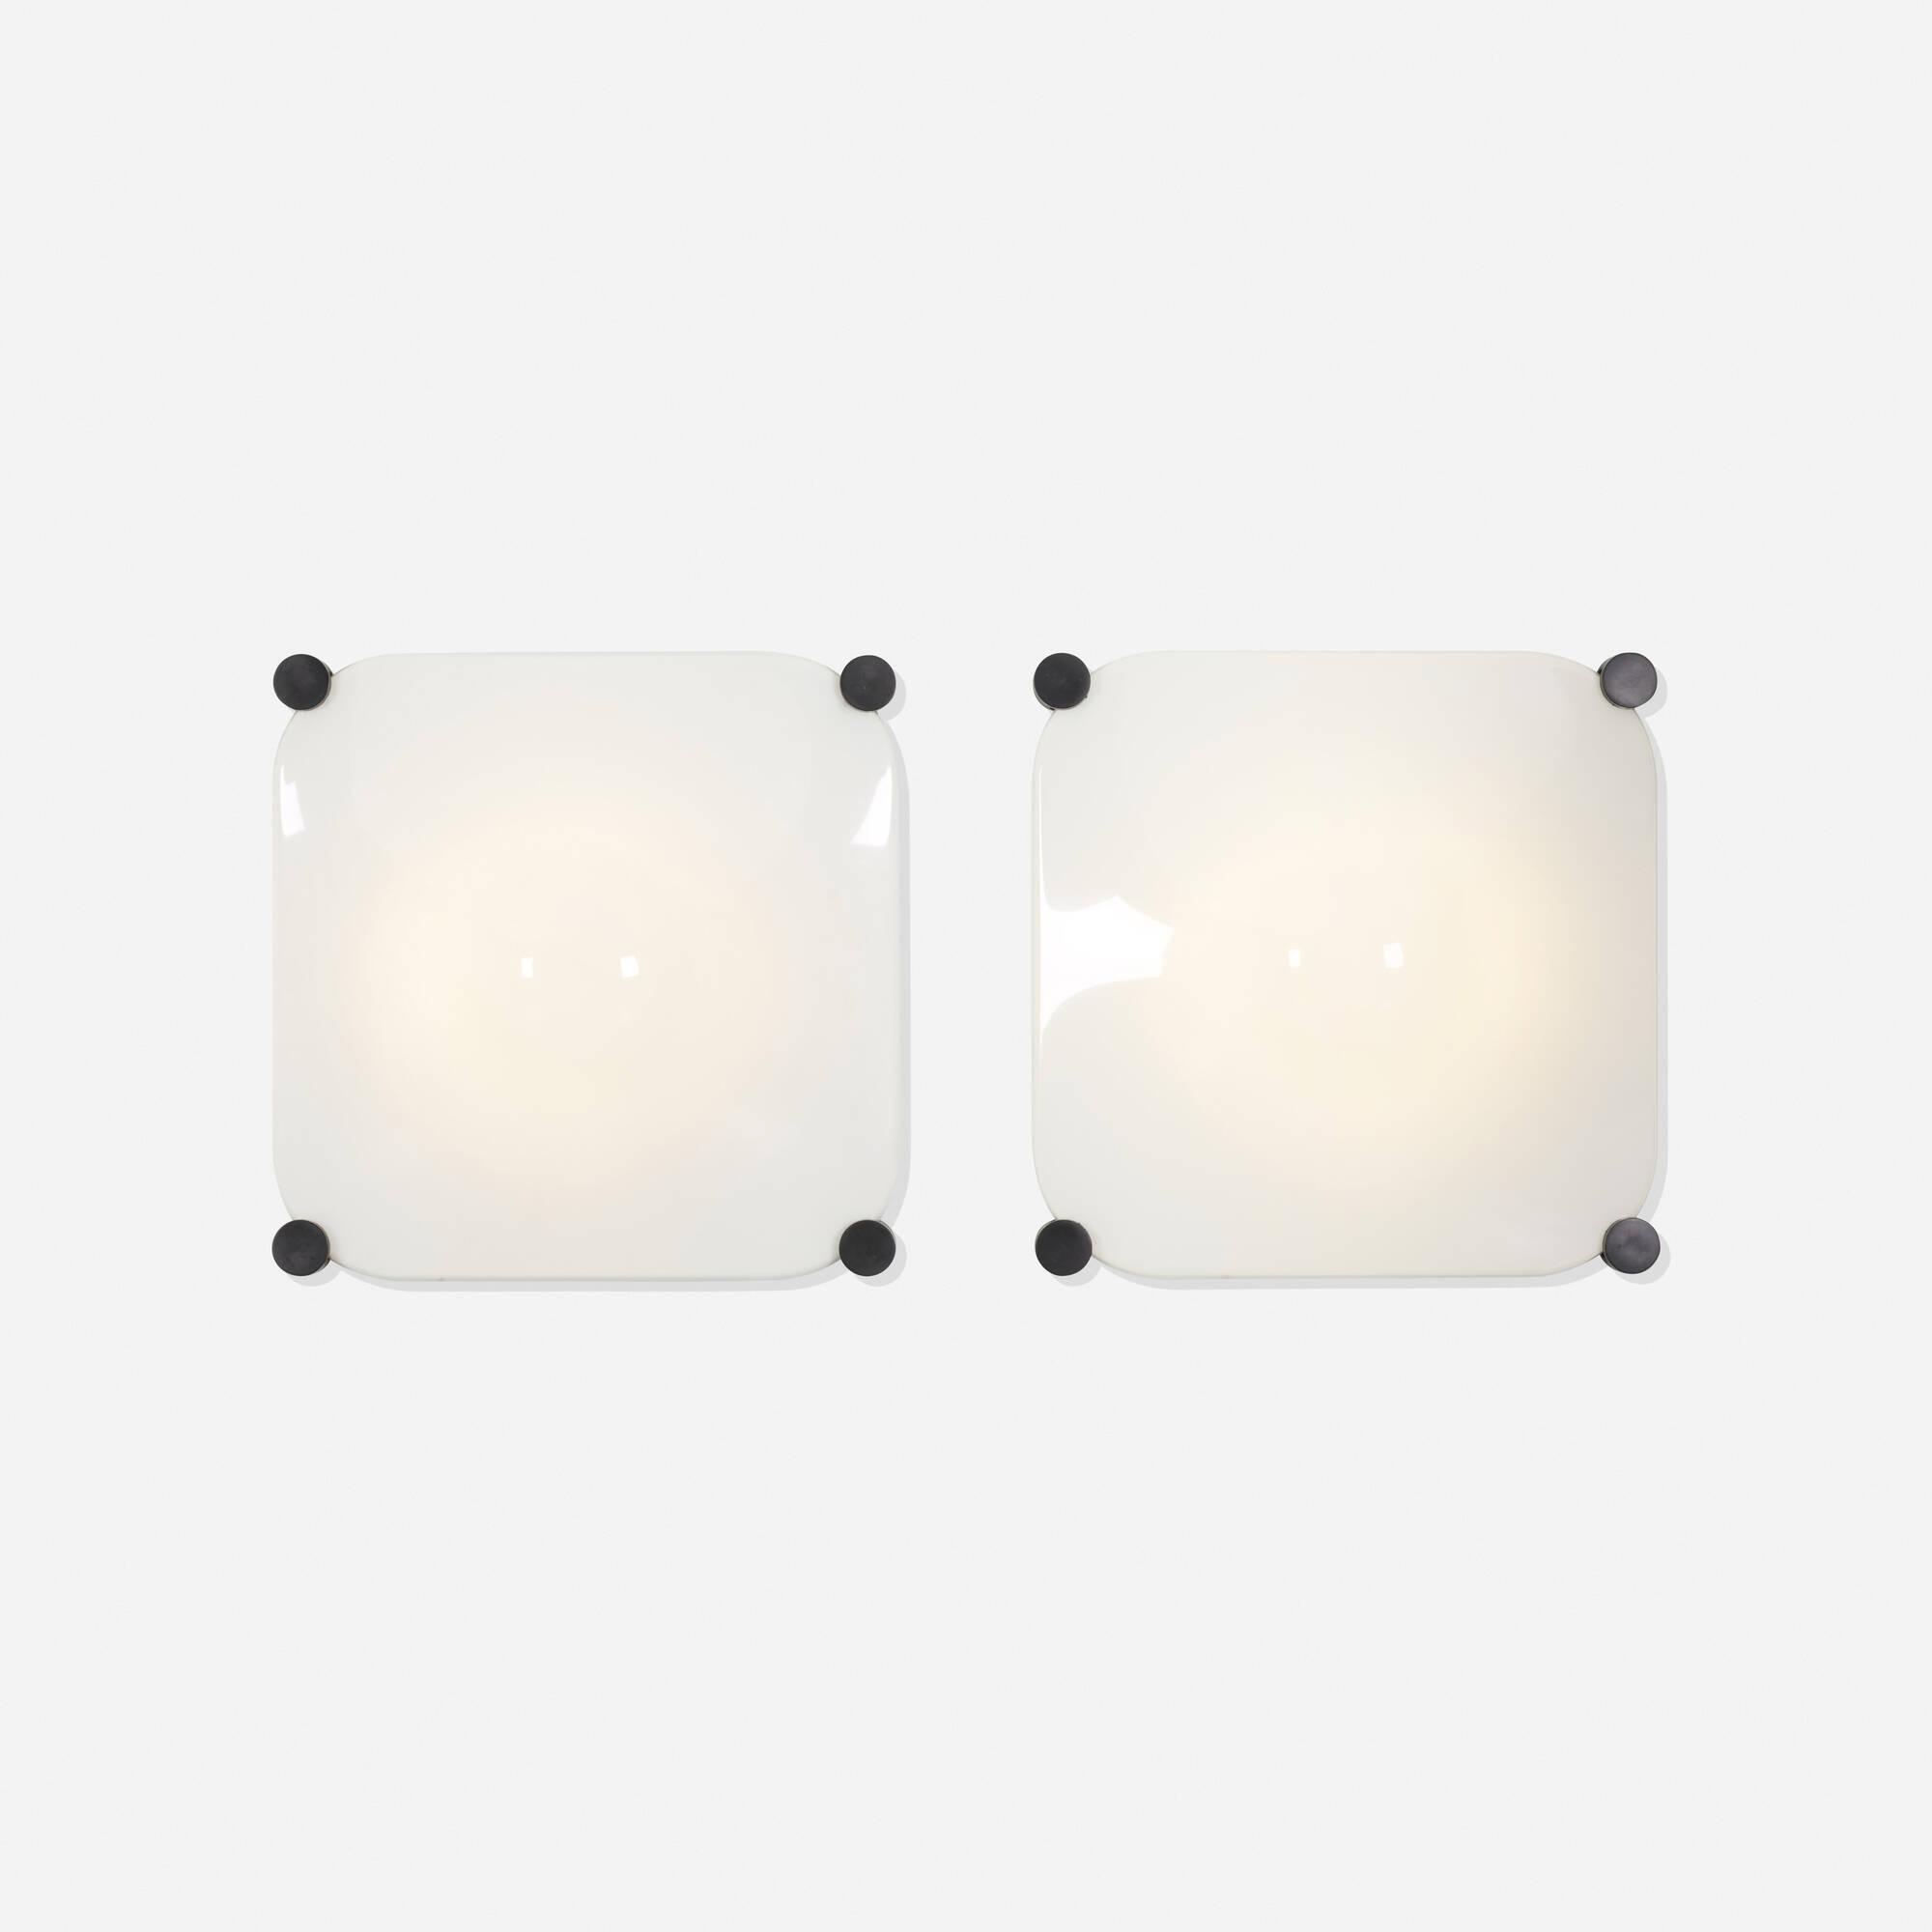 331: Elio Martinelli / Bolla Luminous wall panels, pair (2 of 2)